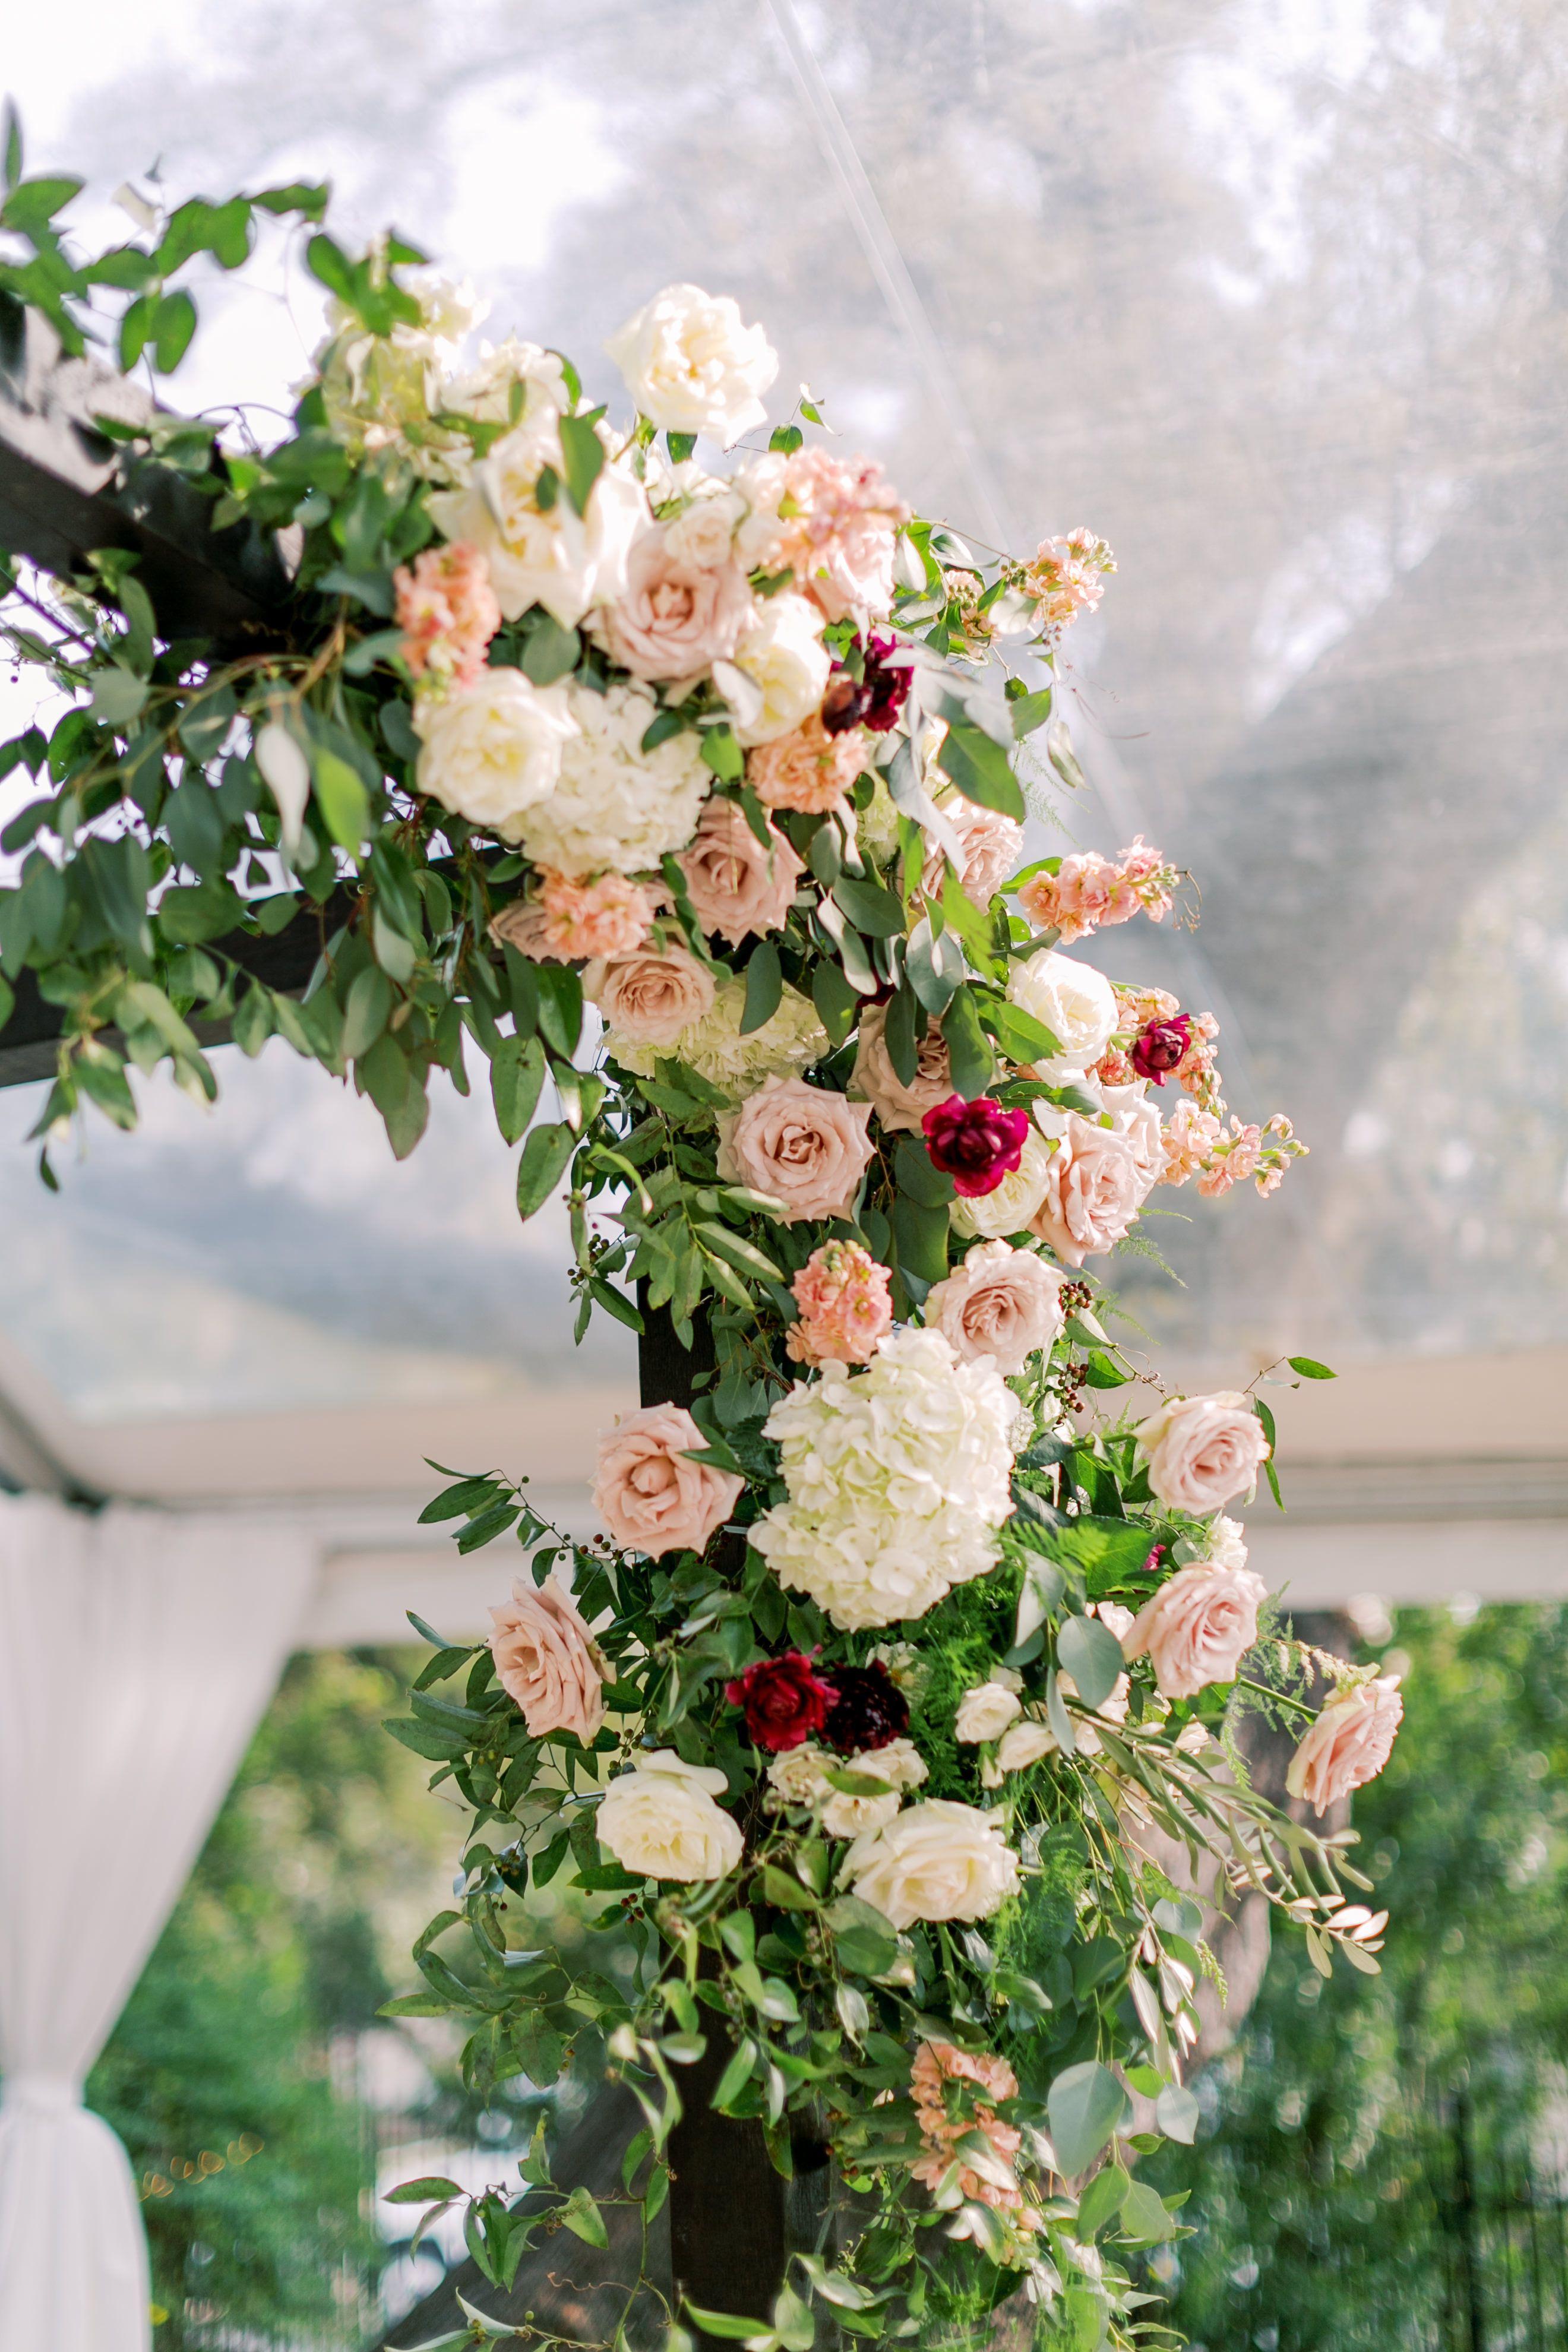 Allan House Wedding In 2020 Wedding Floral Floral Wreath